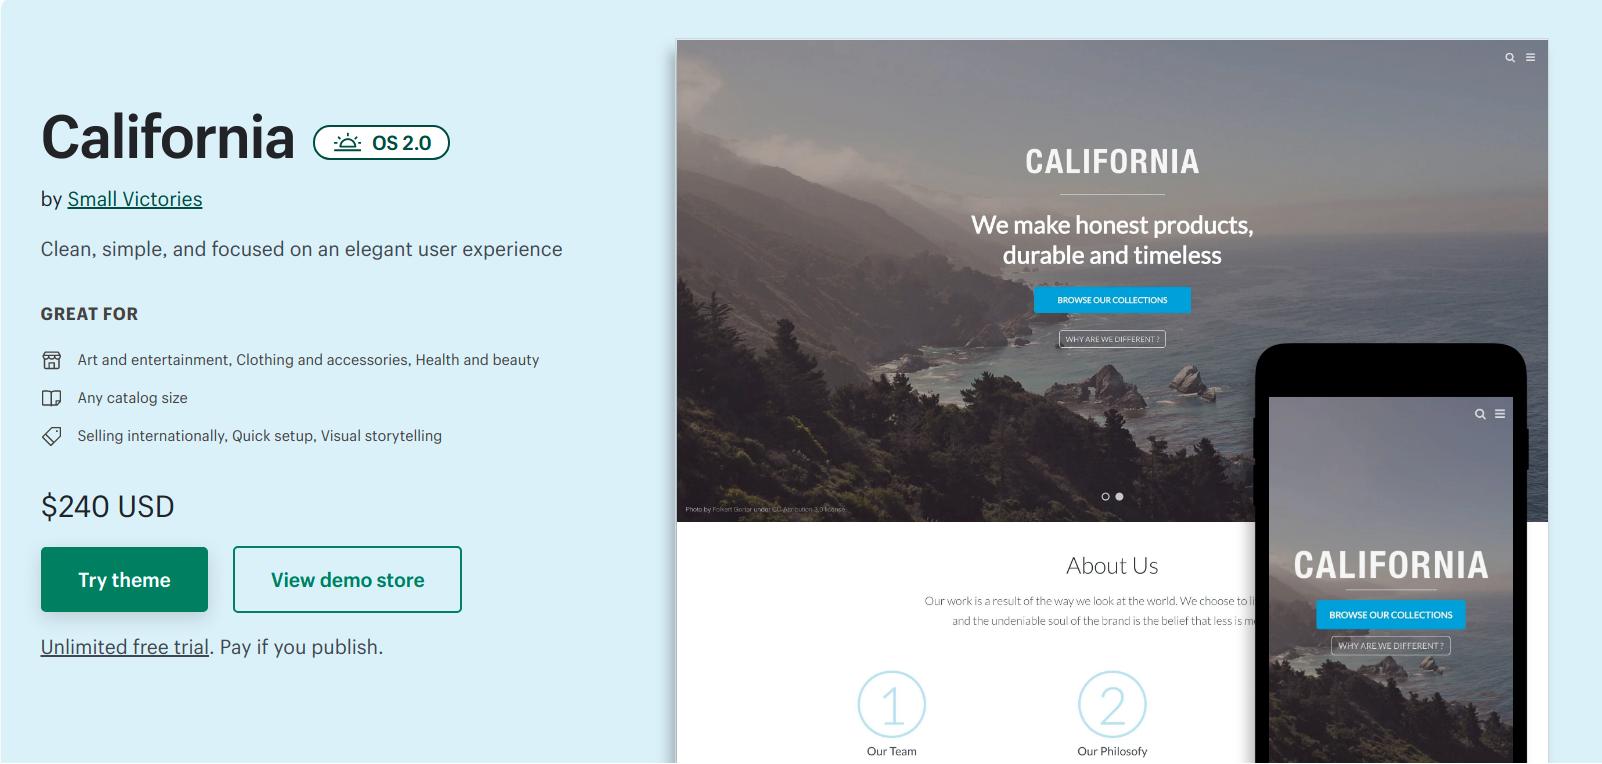 california-online-store-2-shopify-theme